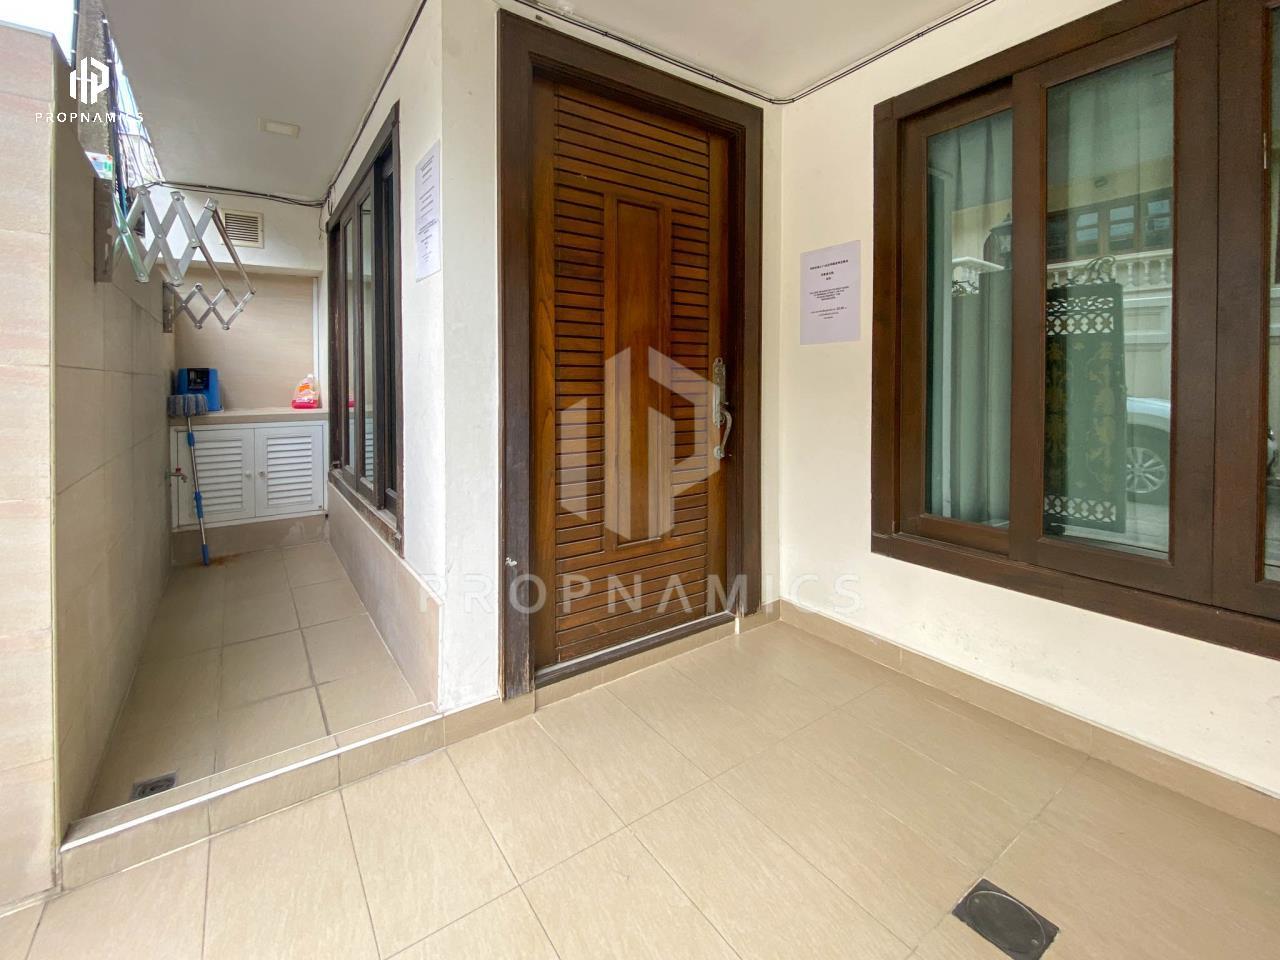 Propnamics Co., Ltd Agency's FOR RENT: SINGLE HOUSE IN SUKHUMVIT 26 2